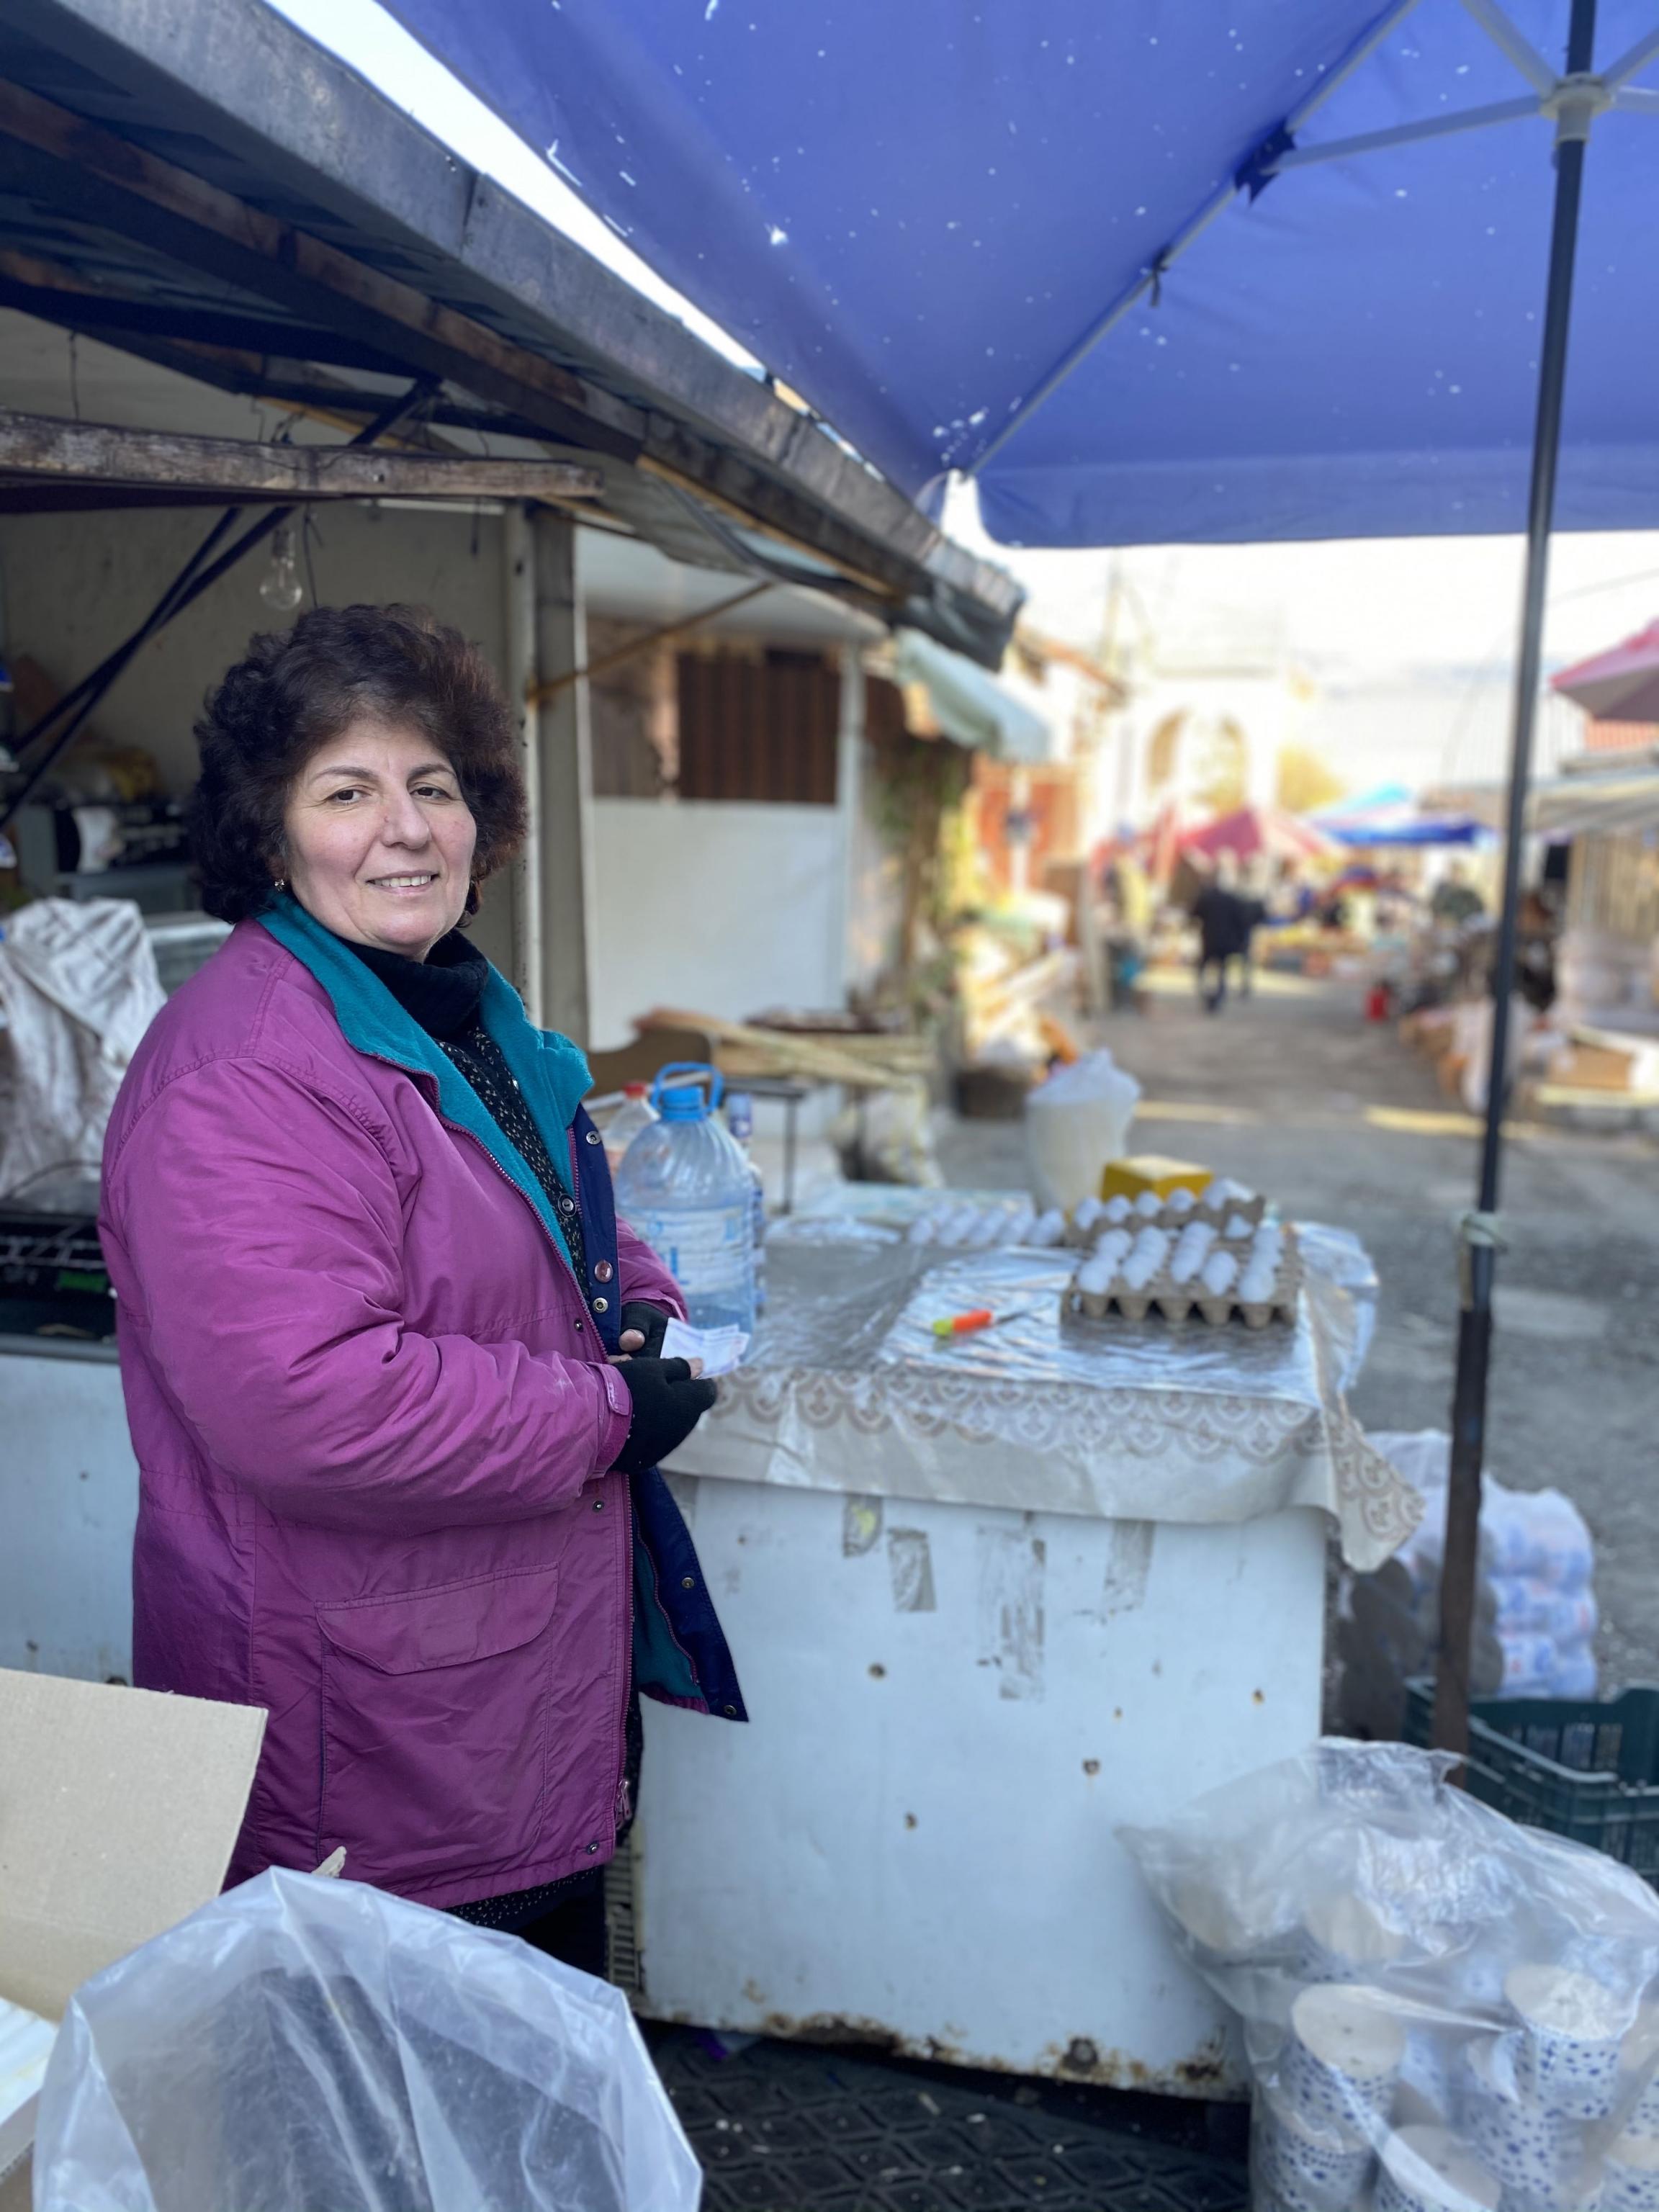 Rima Arushanyan, 58, sells eggs and homemade vodka in the Stepanakert market.Stepanakert is the de facto capital of Nagorno-Karabakh.